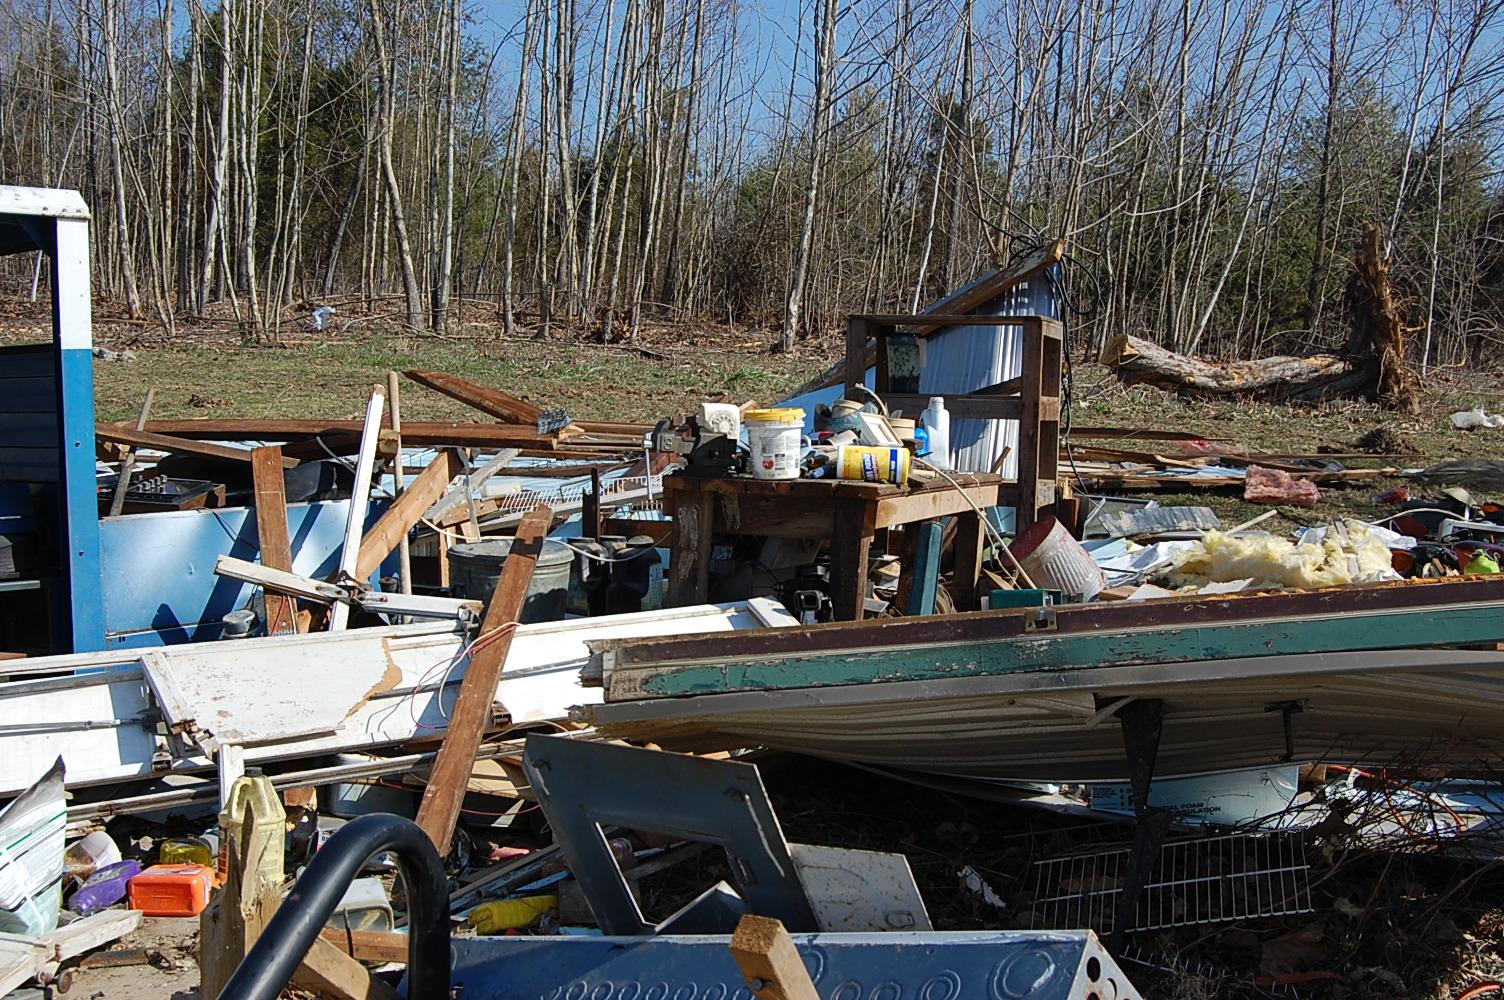 Tornado destruction in Henryville, Indiana